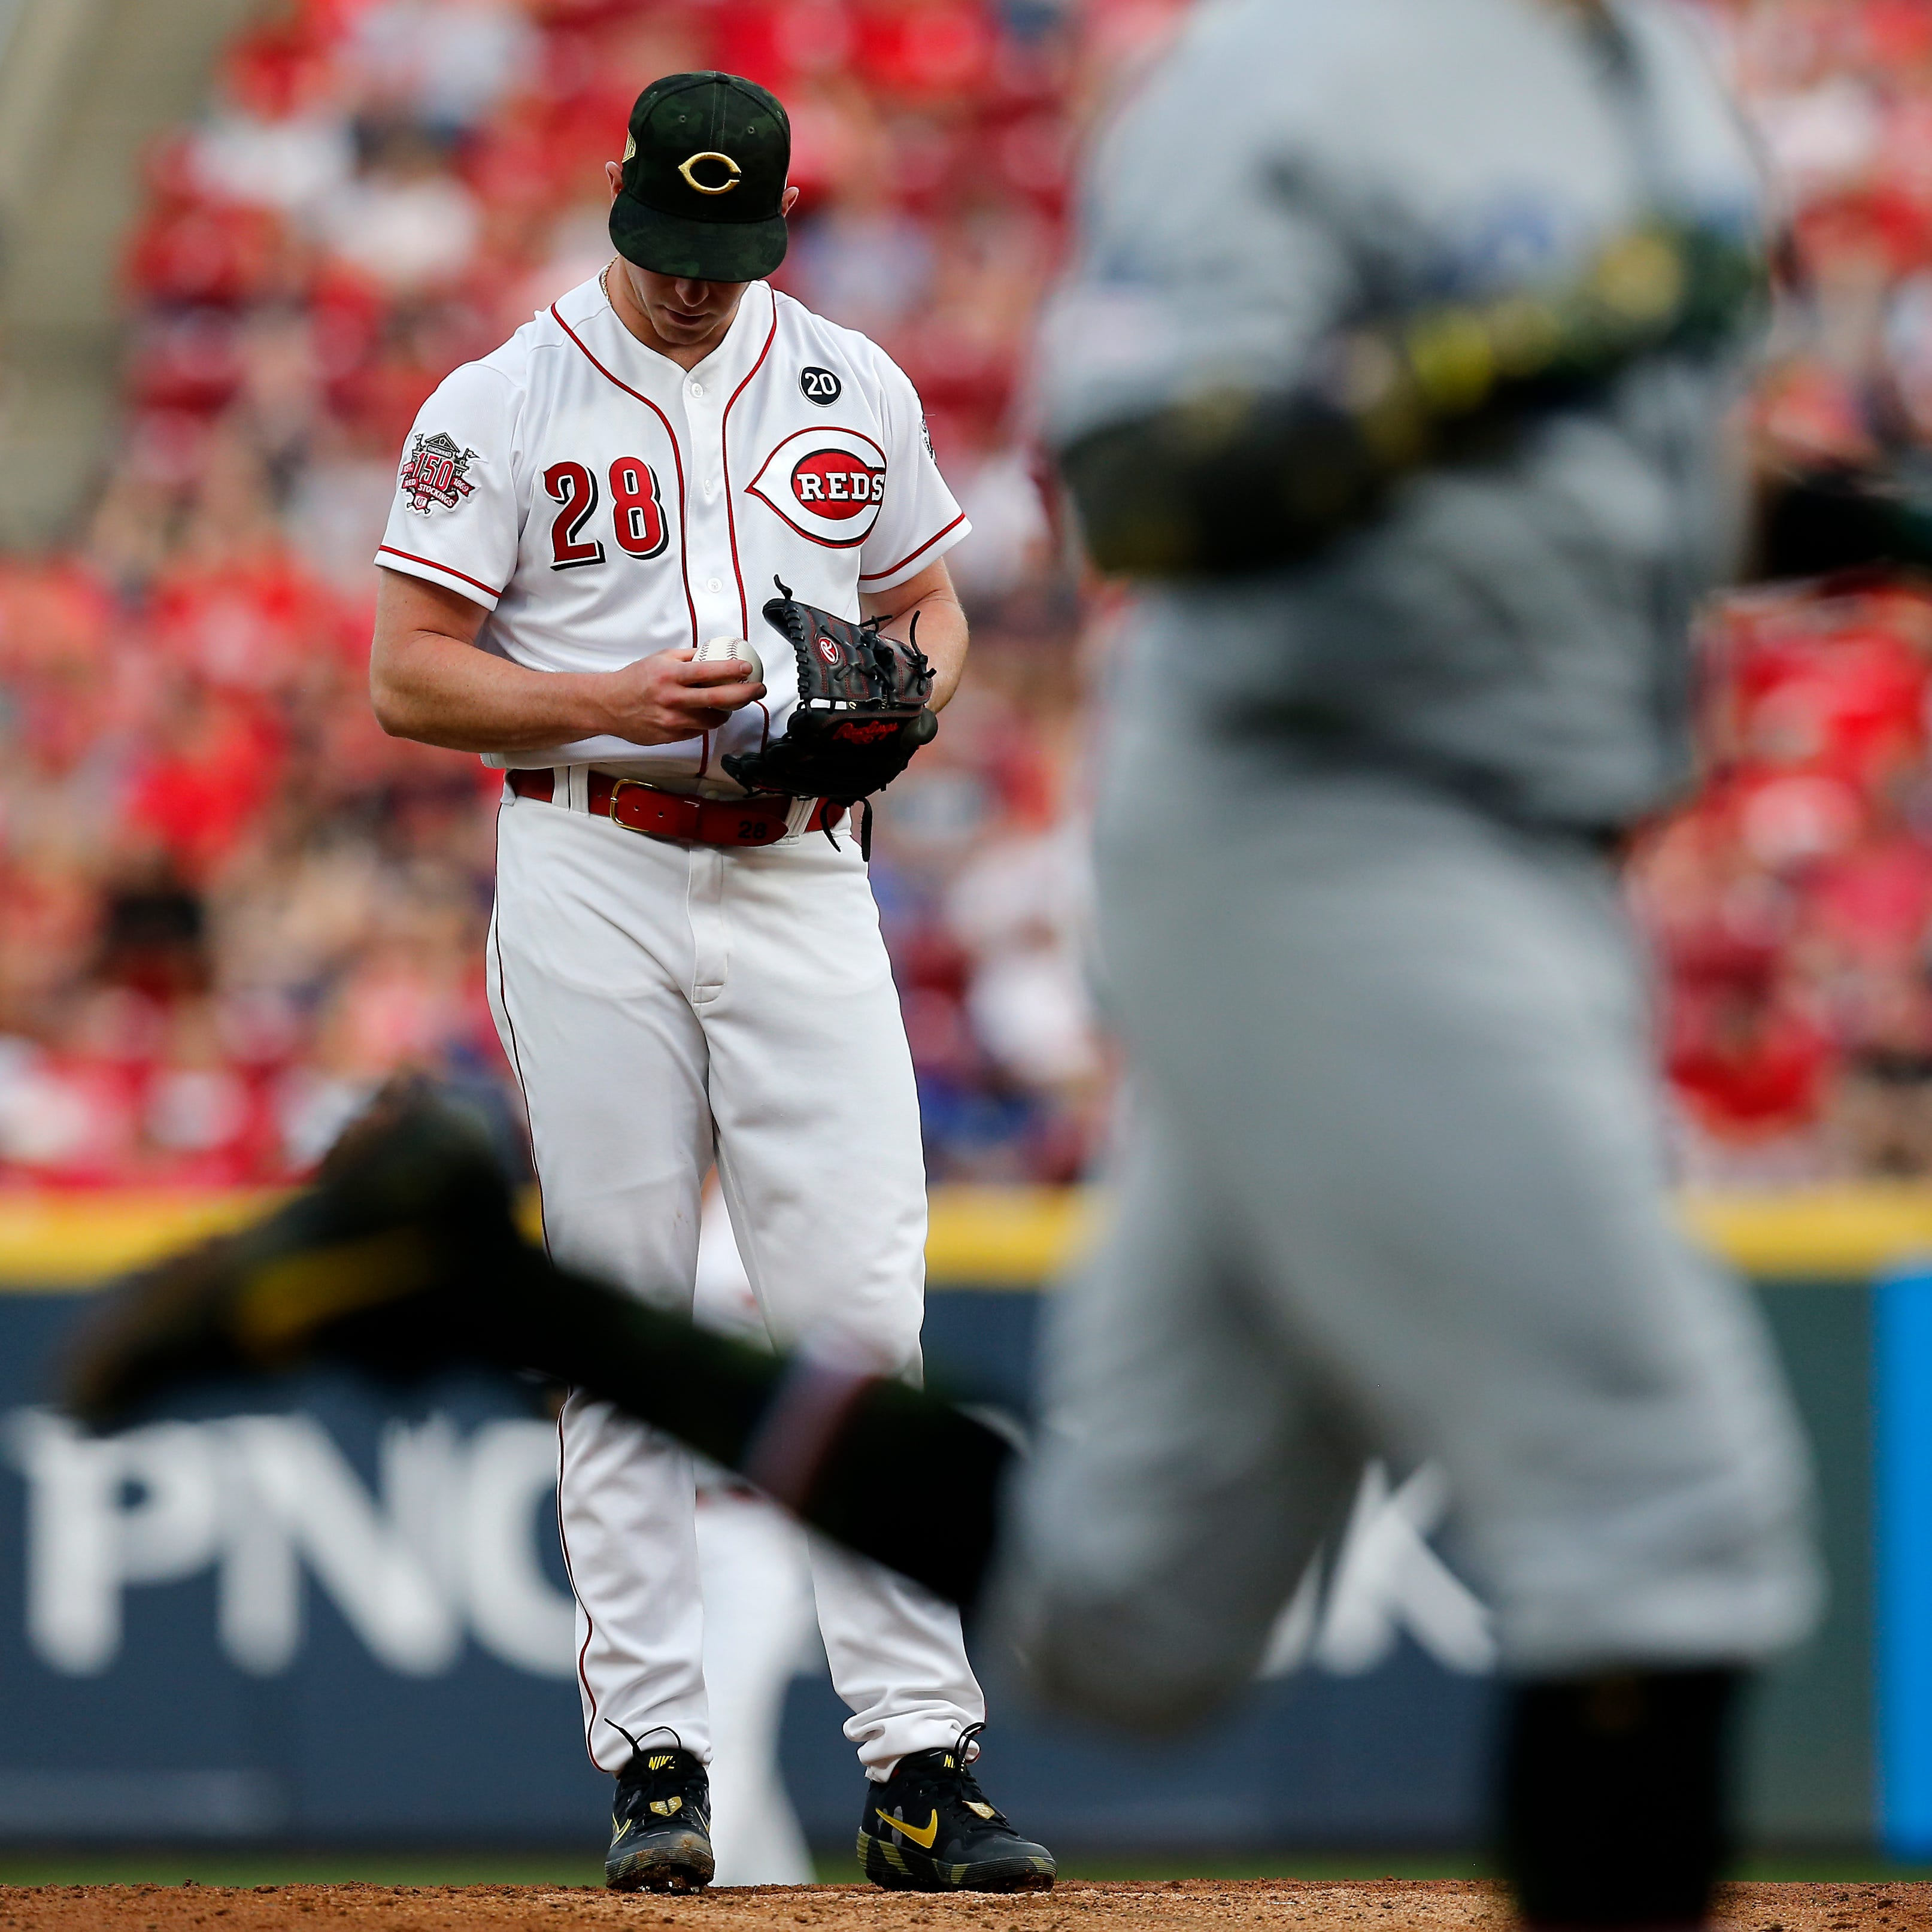 Home runs hurt Anthony DeSclafani, Cincinnati Reds in loss to Los Angeles Dodgers